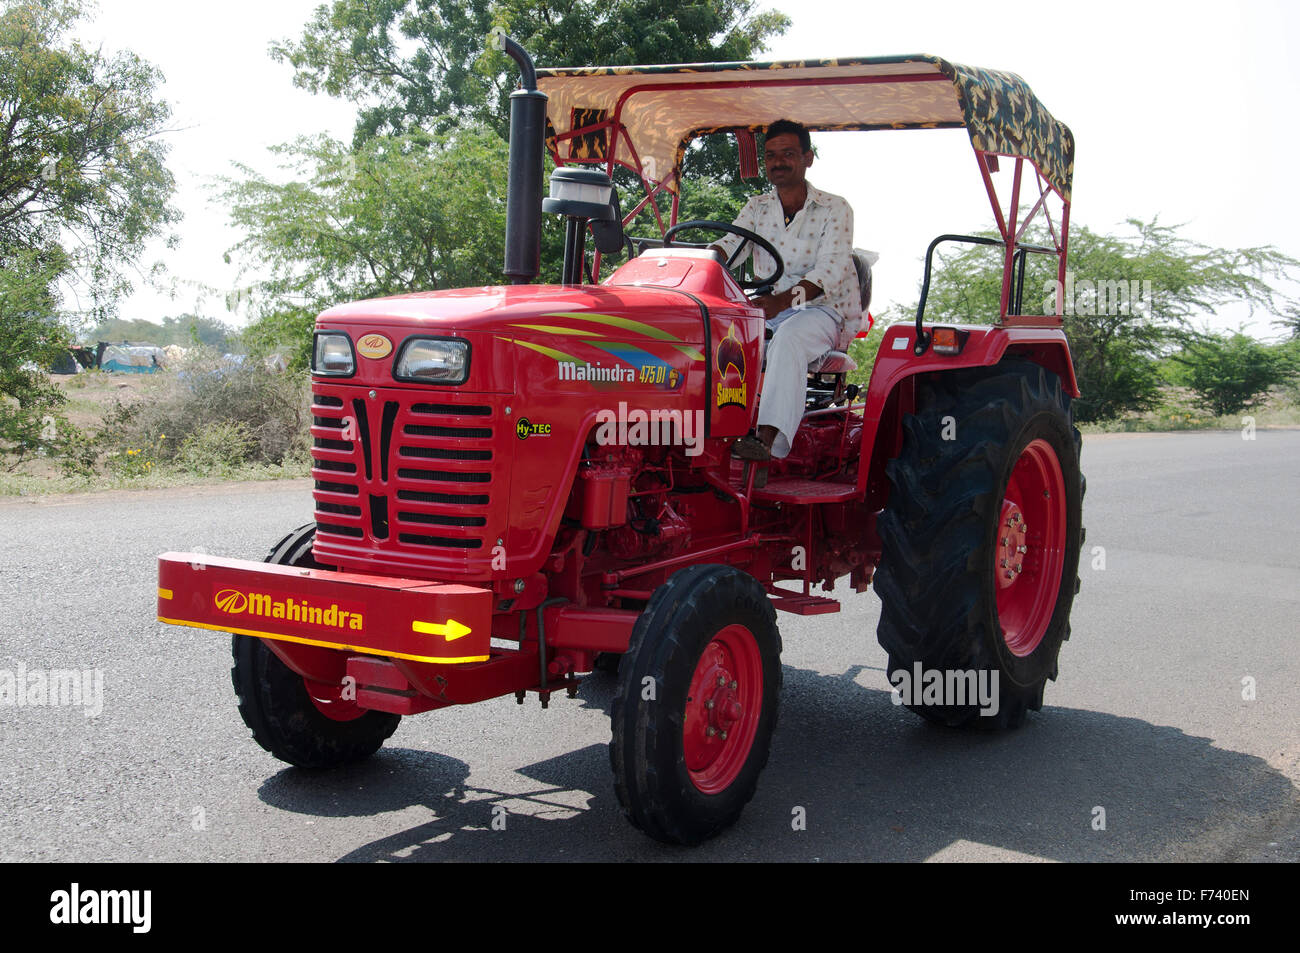 Farmer tractor, shirdi, nasik, maharashtra, india, asia - Stock Image